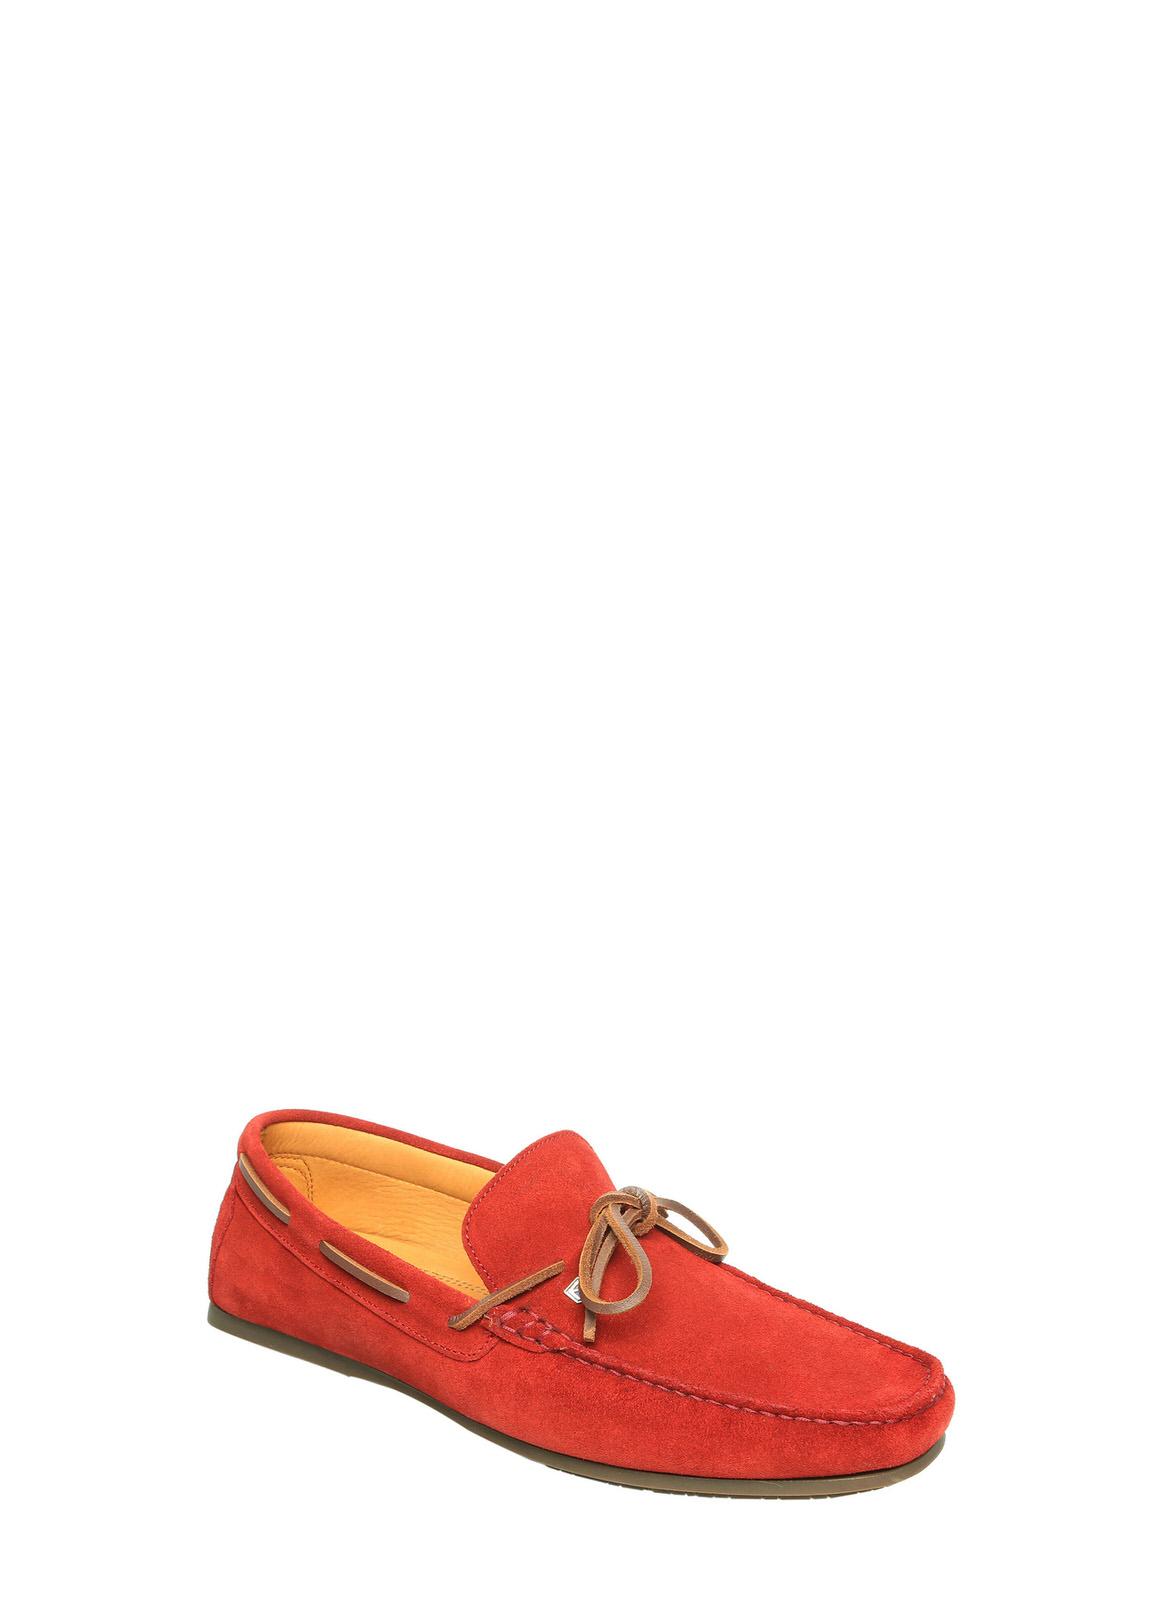 Corsica Mens Deck Shoe - Red